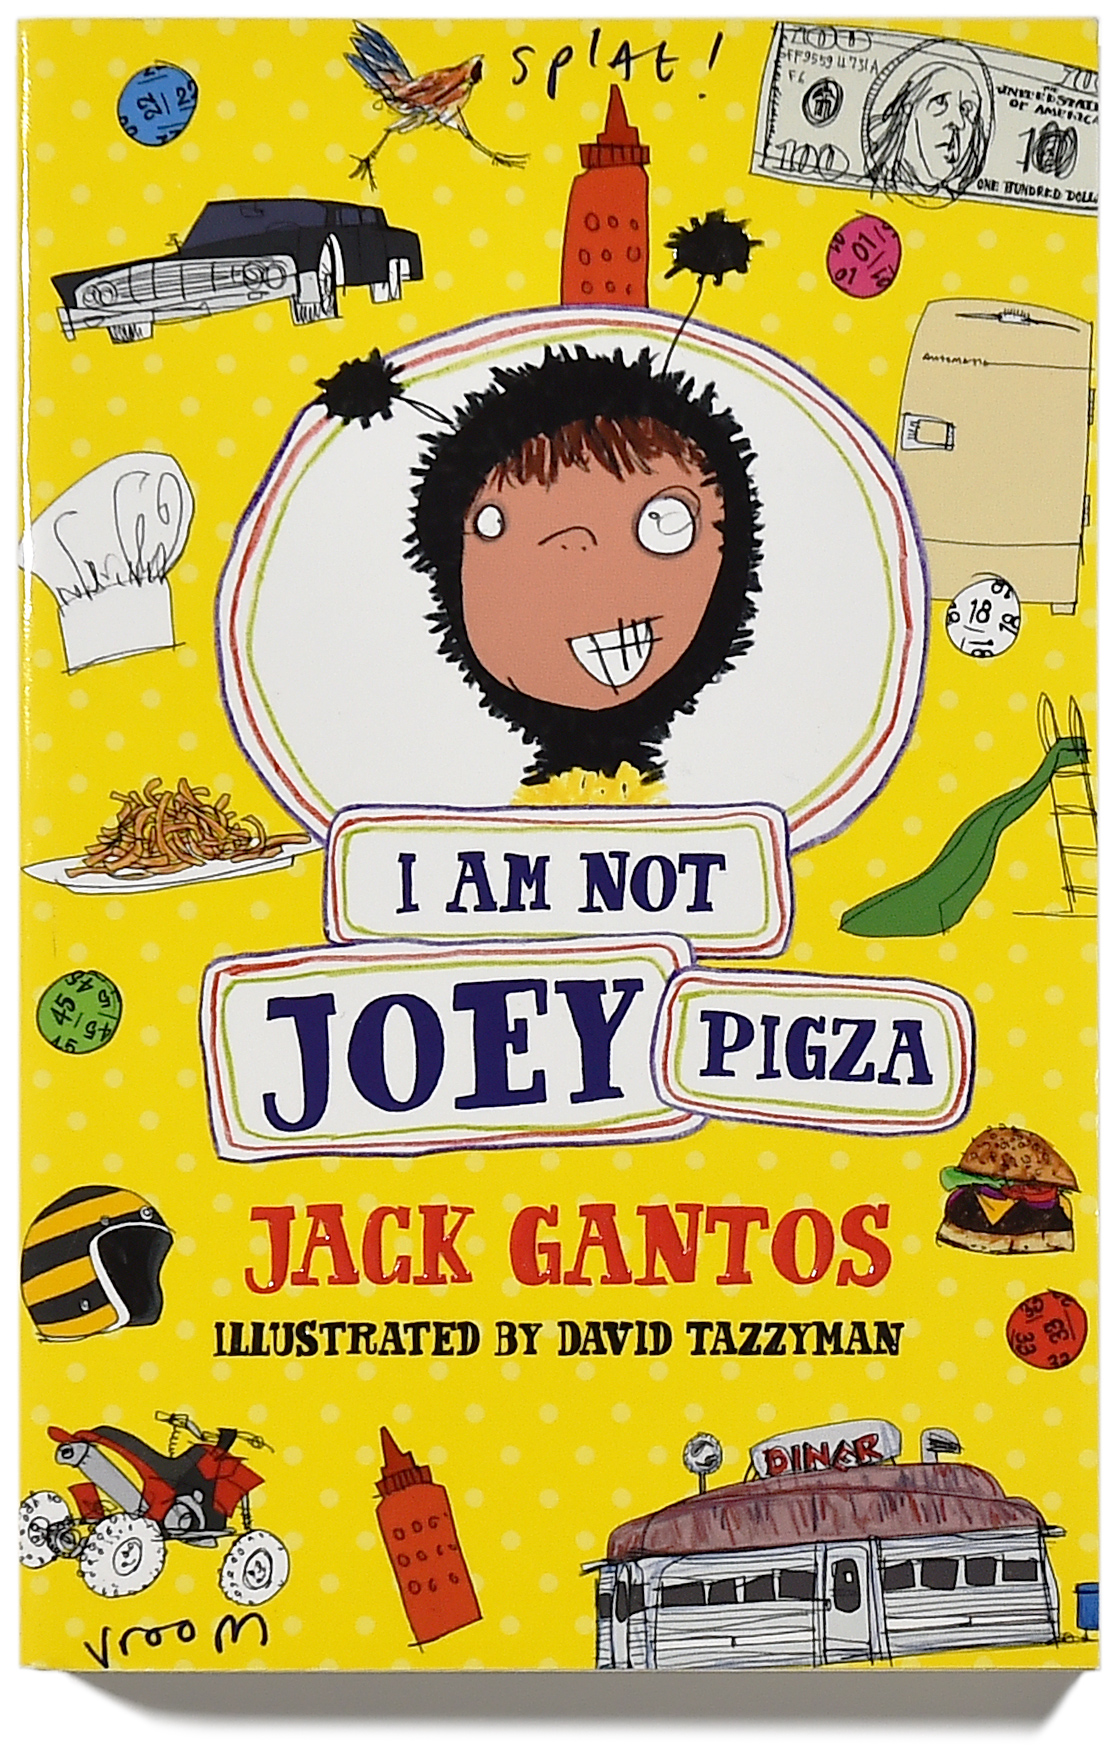 I-Am-Not-Joey-Pigza-cover.FIN.jpg